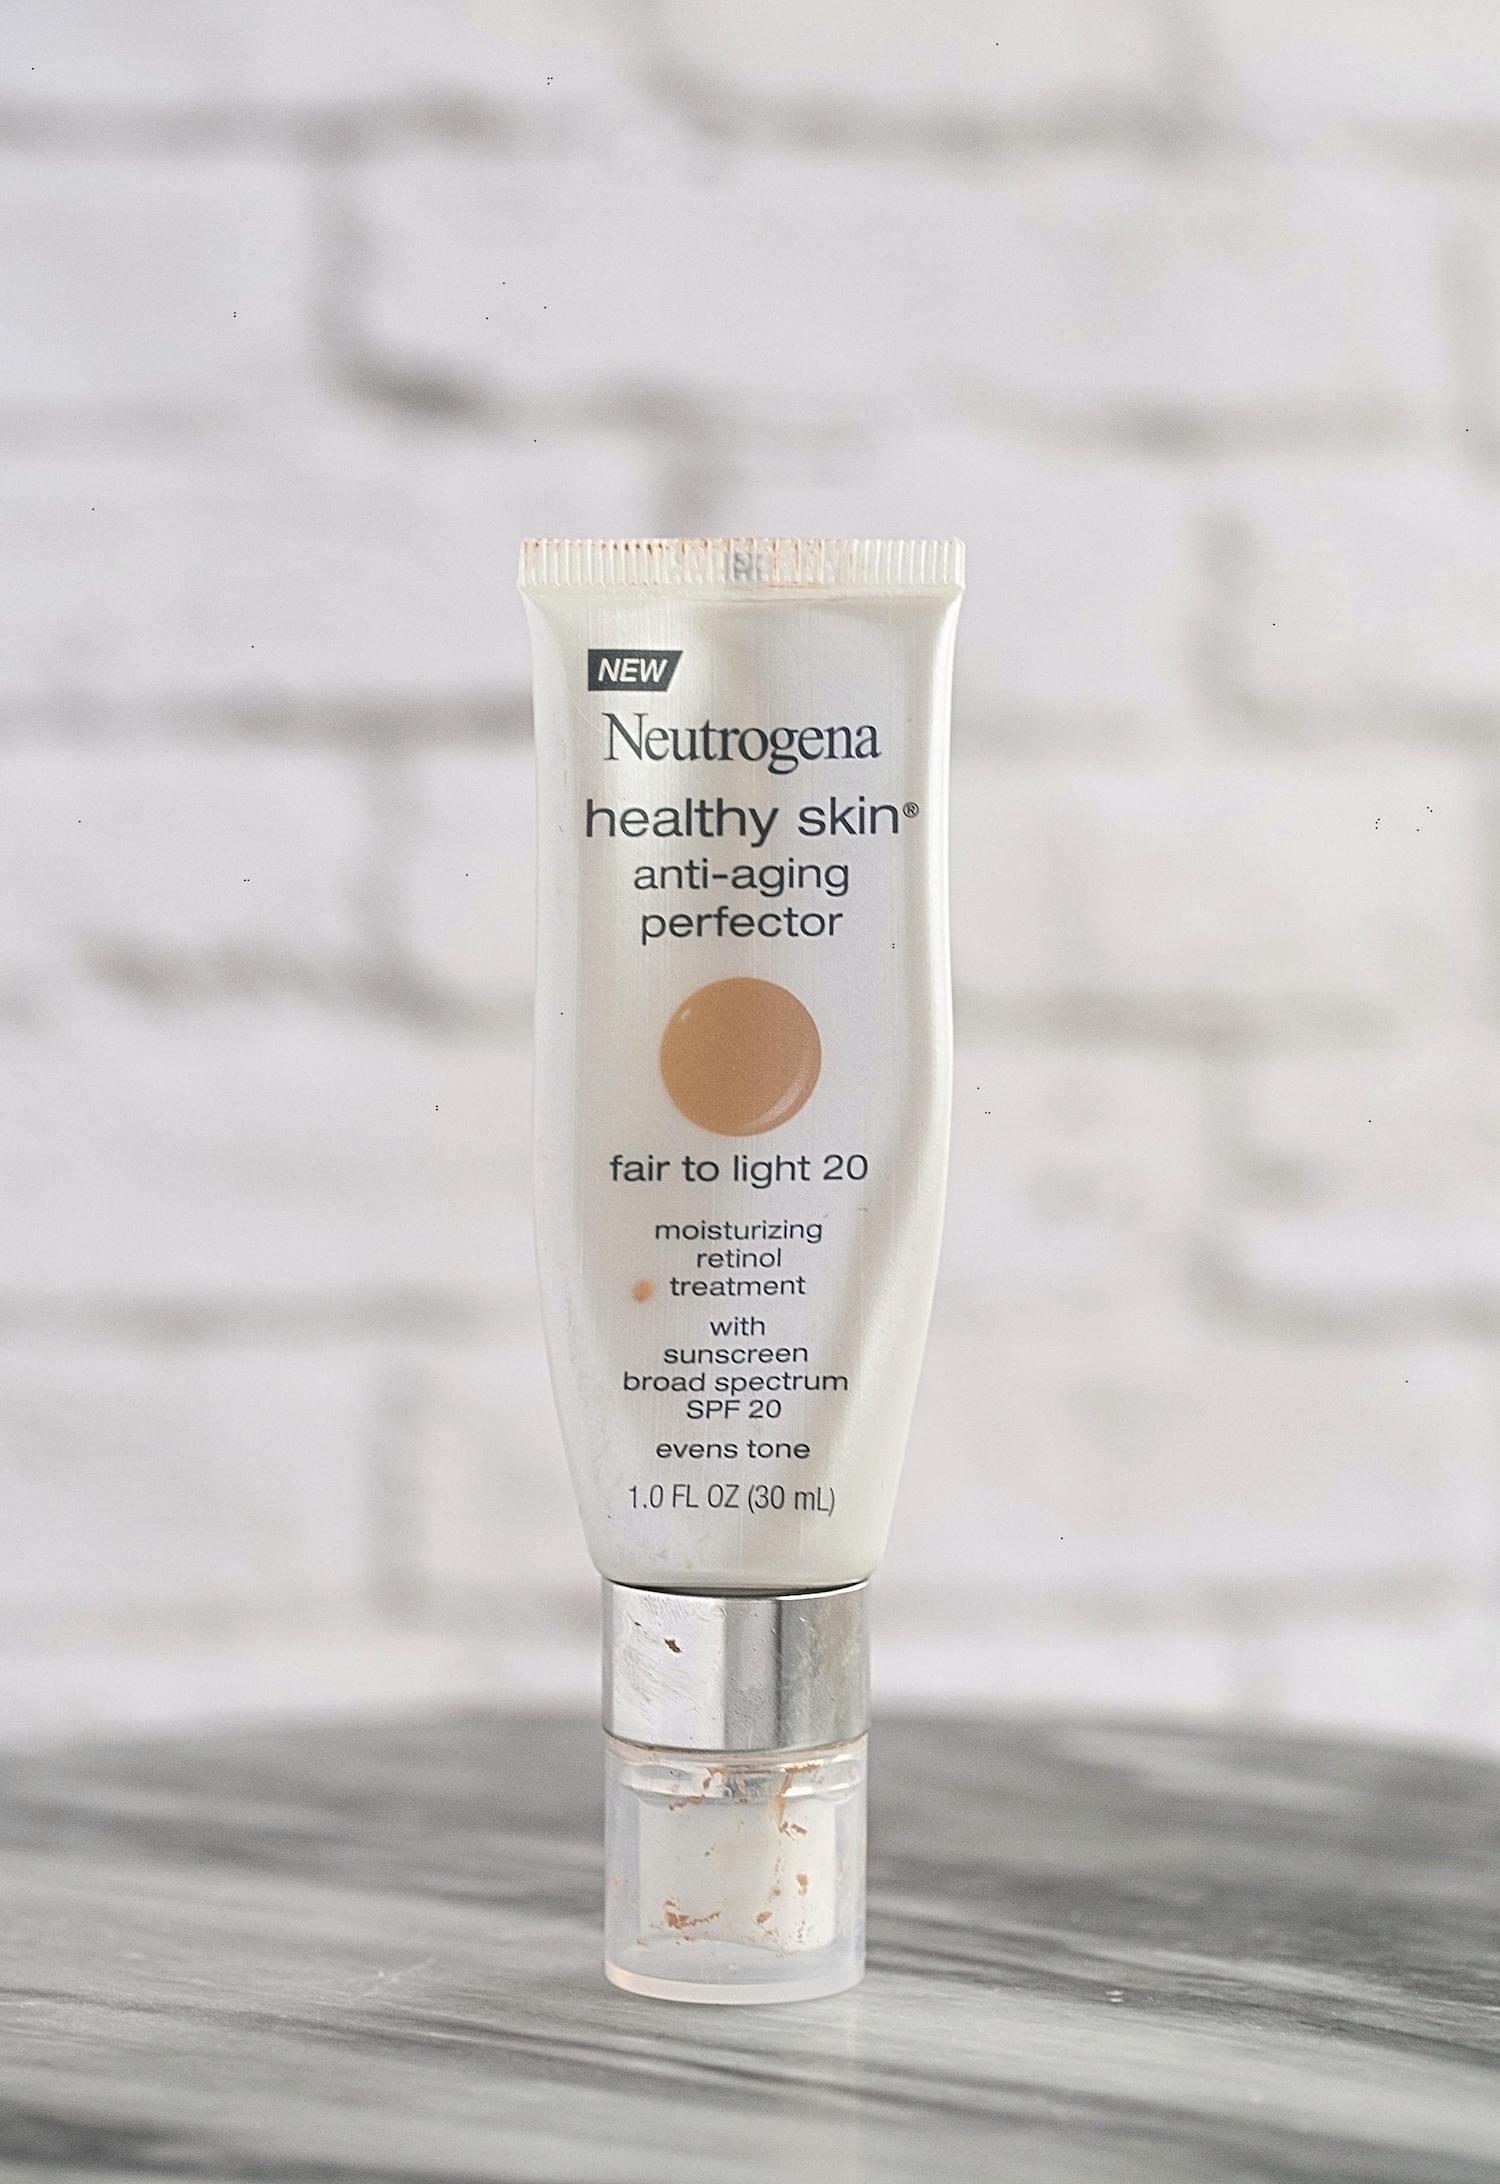 New Favorite Beauty Buys- Neutrogena Healthy Skin Tinted Moisturizer | TrufflesandTrends.com